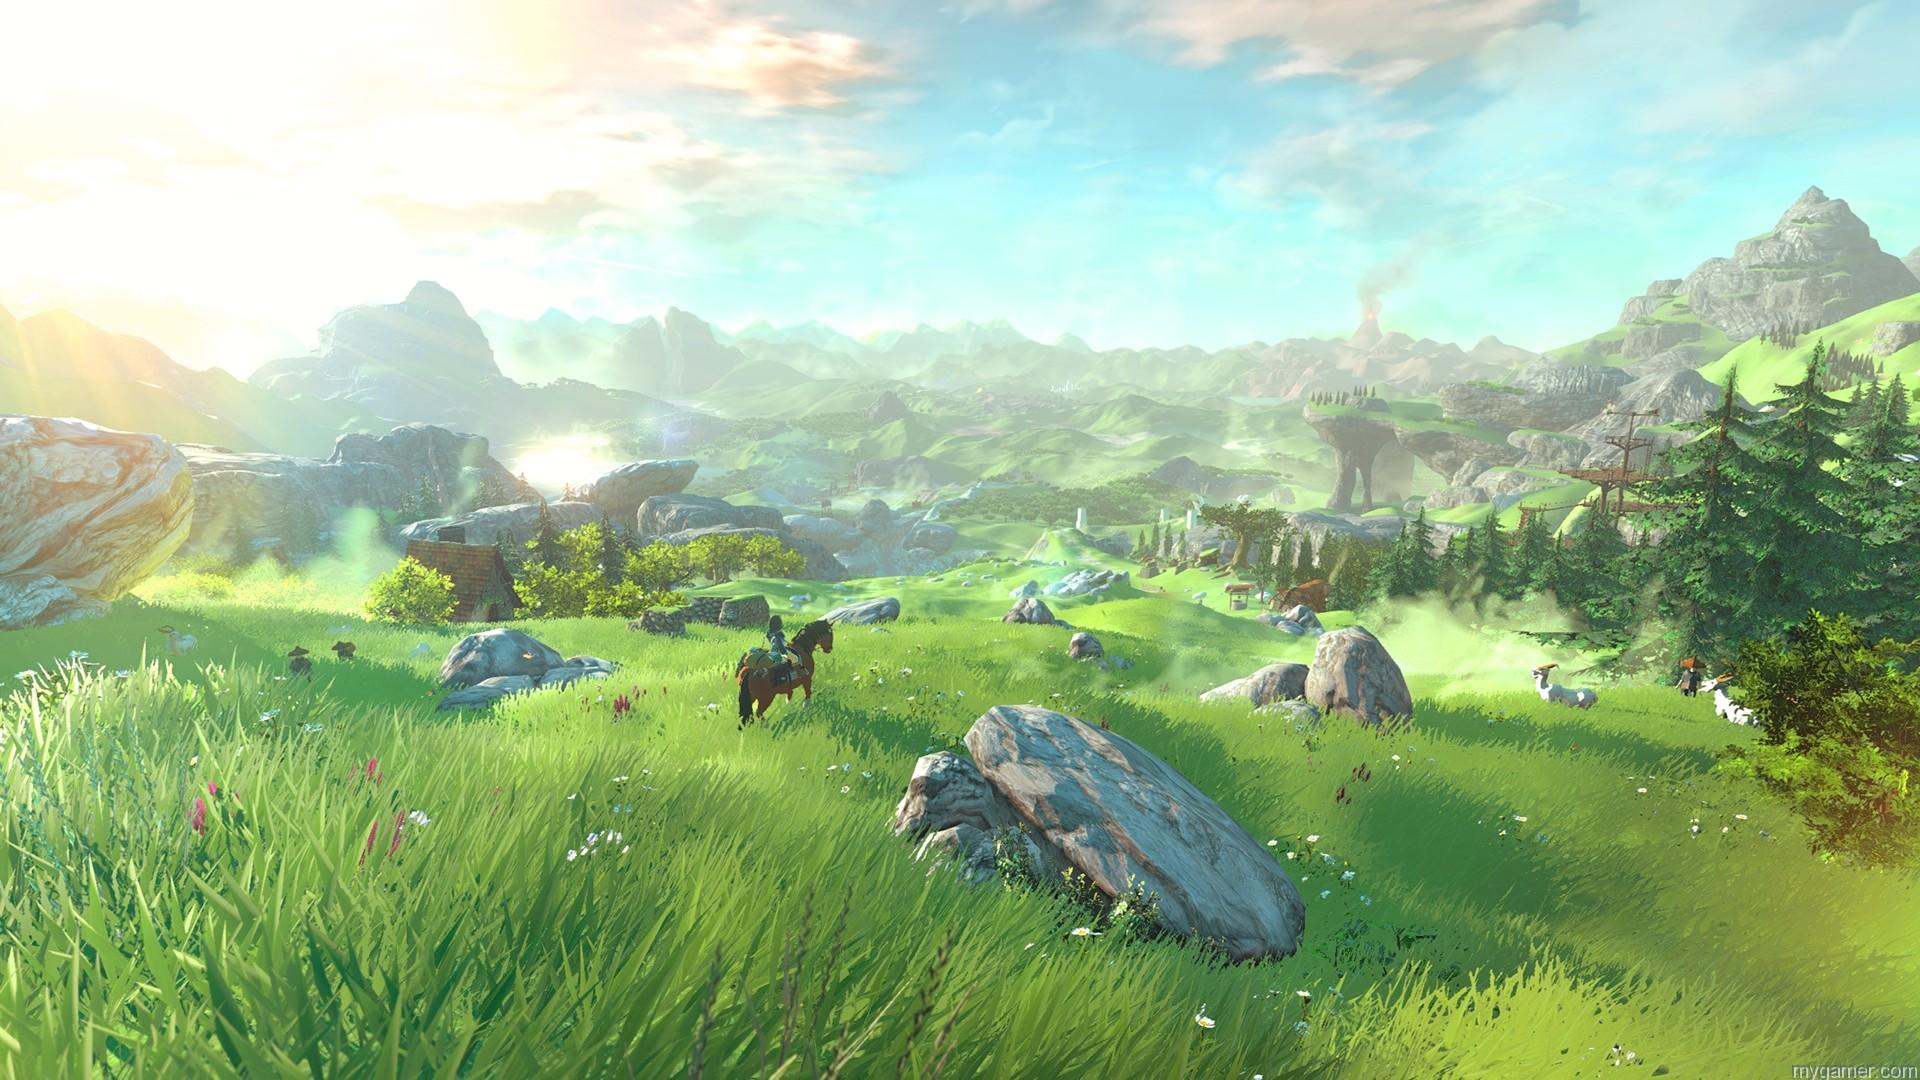 Largest open world in Zelda series The Legend of Zelda on Wii U Preview The Legend of Zelda on Wii U Preview Open World in Zelda Wii U